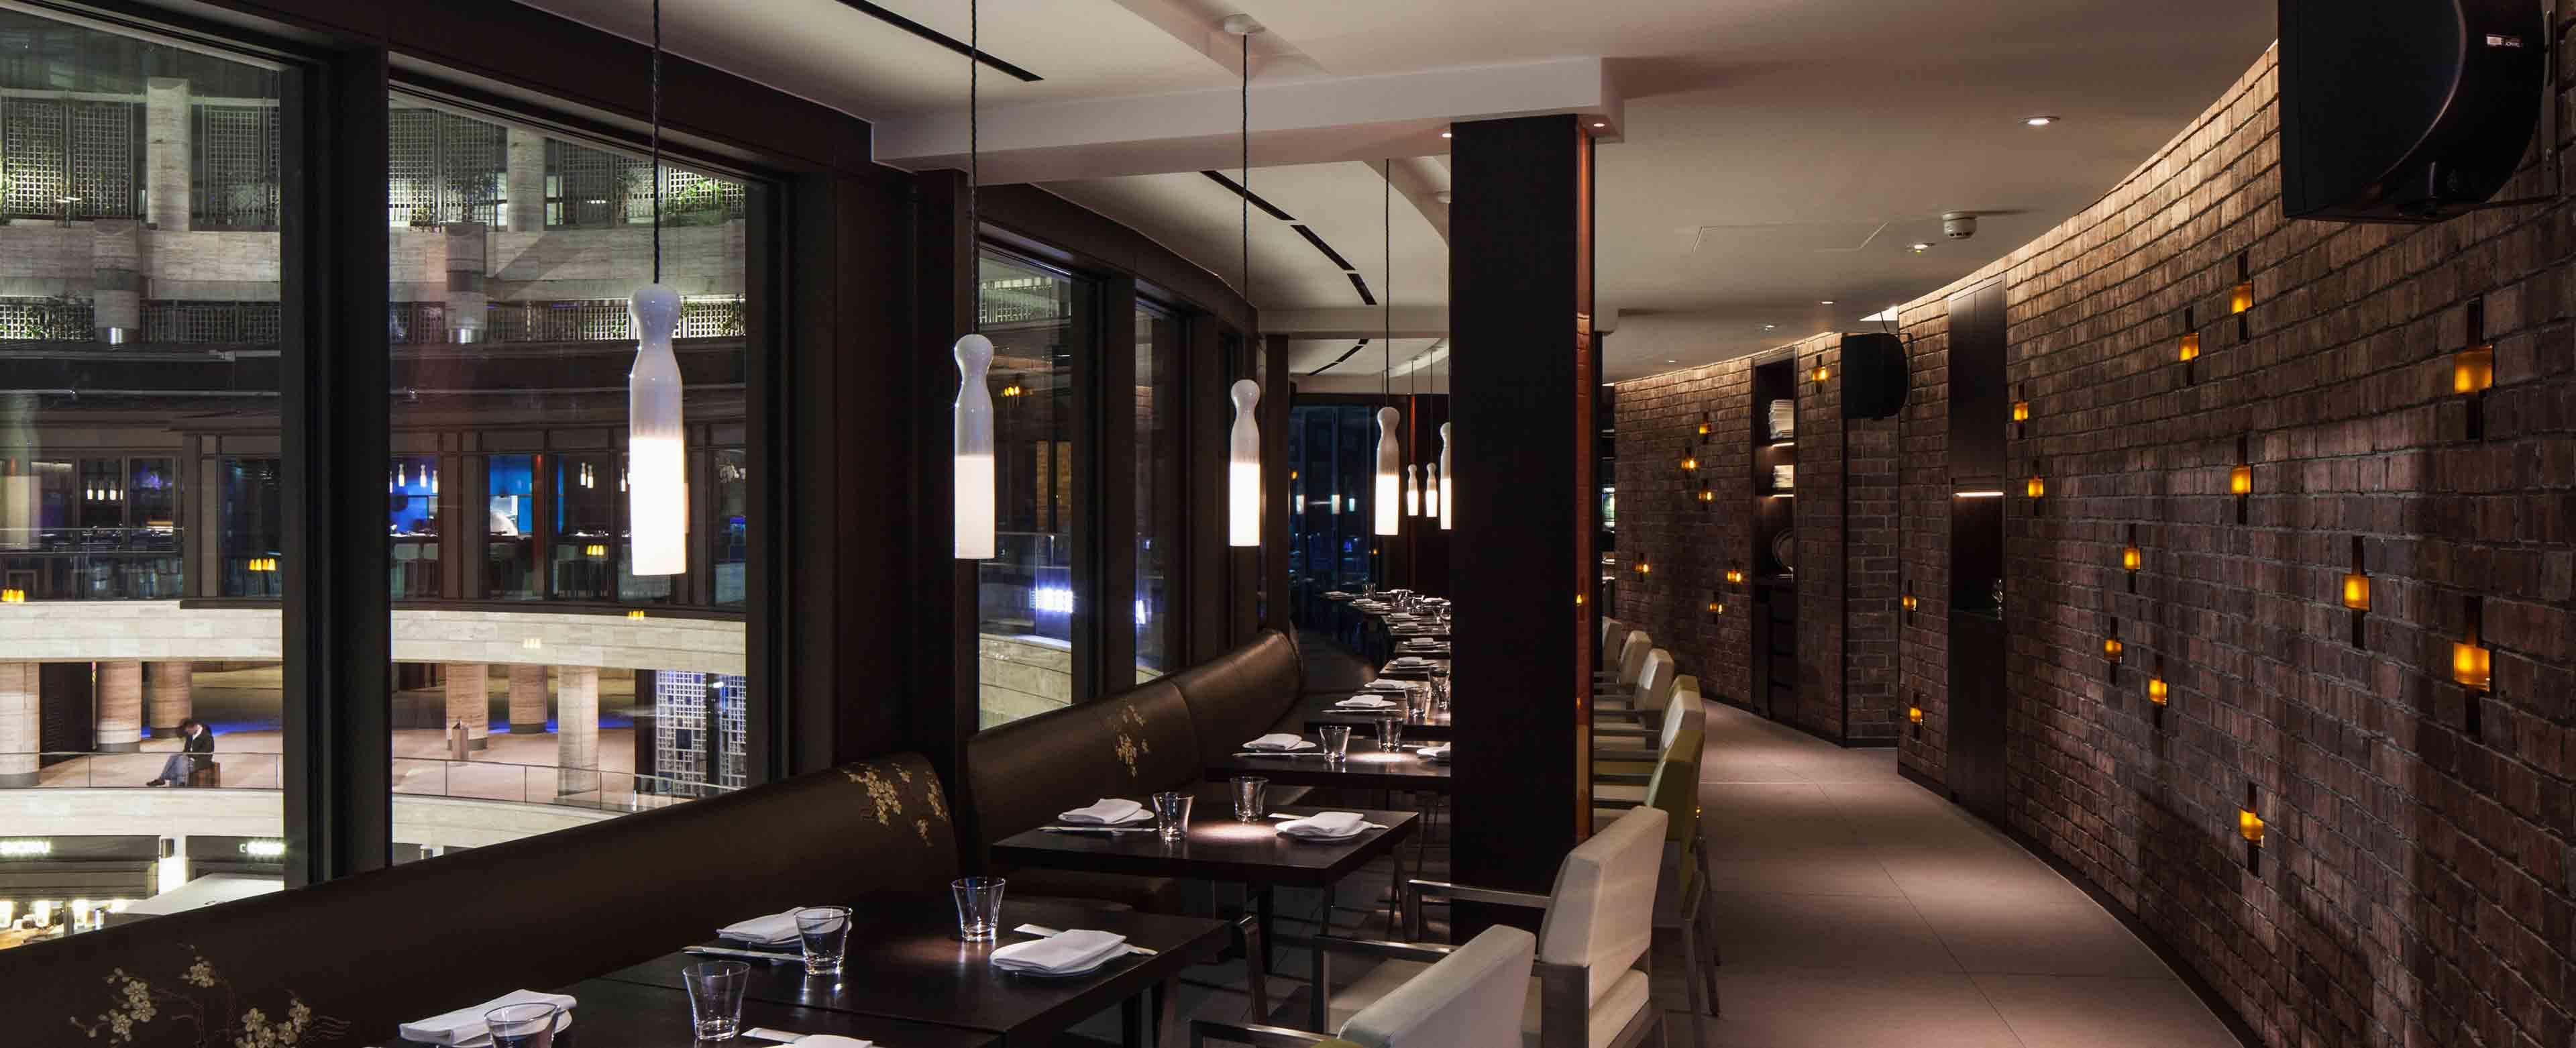 Integrated Wall Lights Glazed Ceramic Lanterns Restaurant Nulty Bespoke